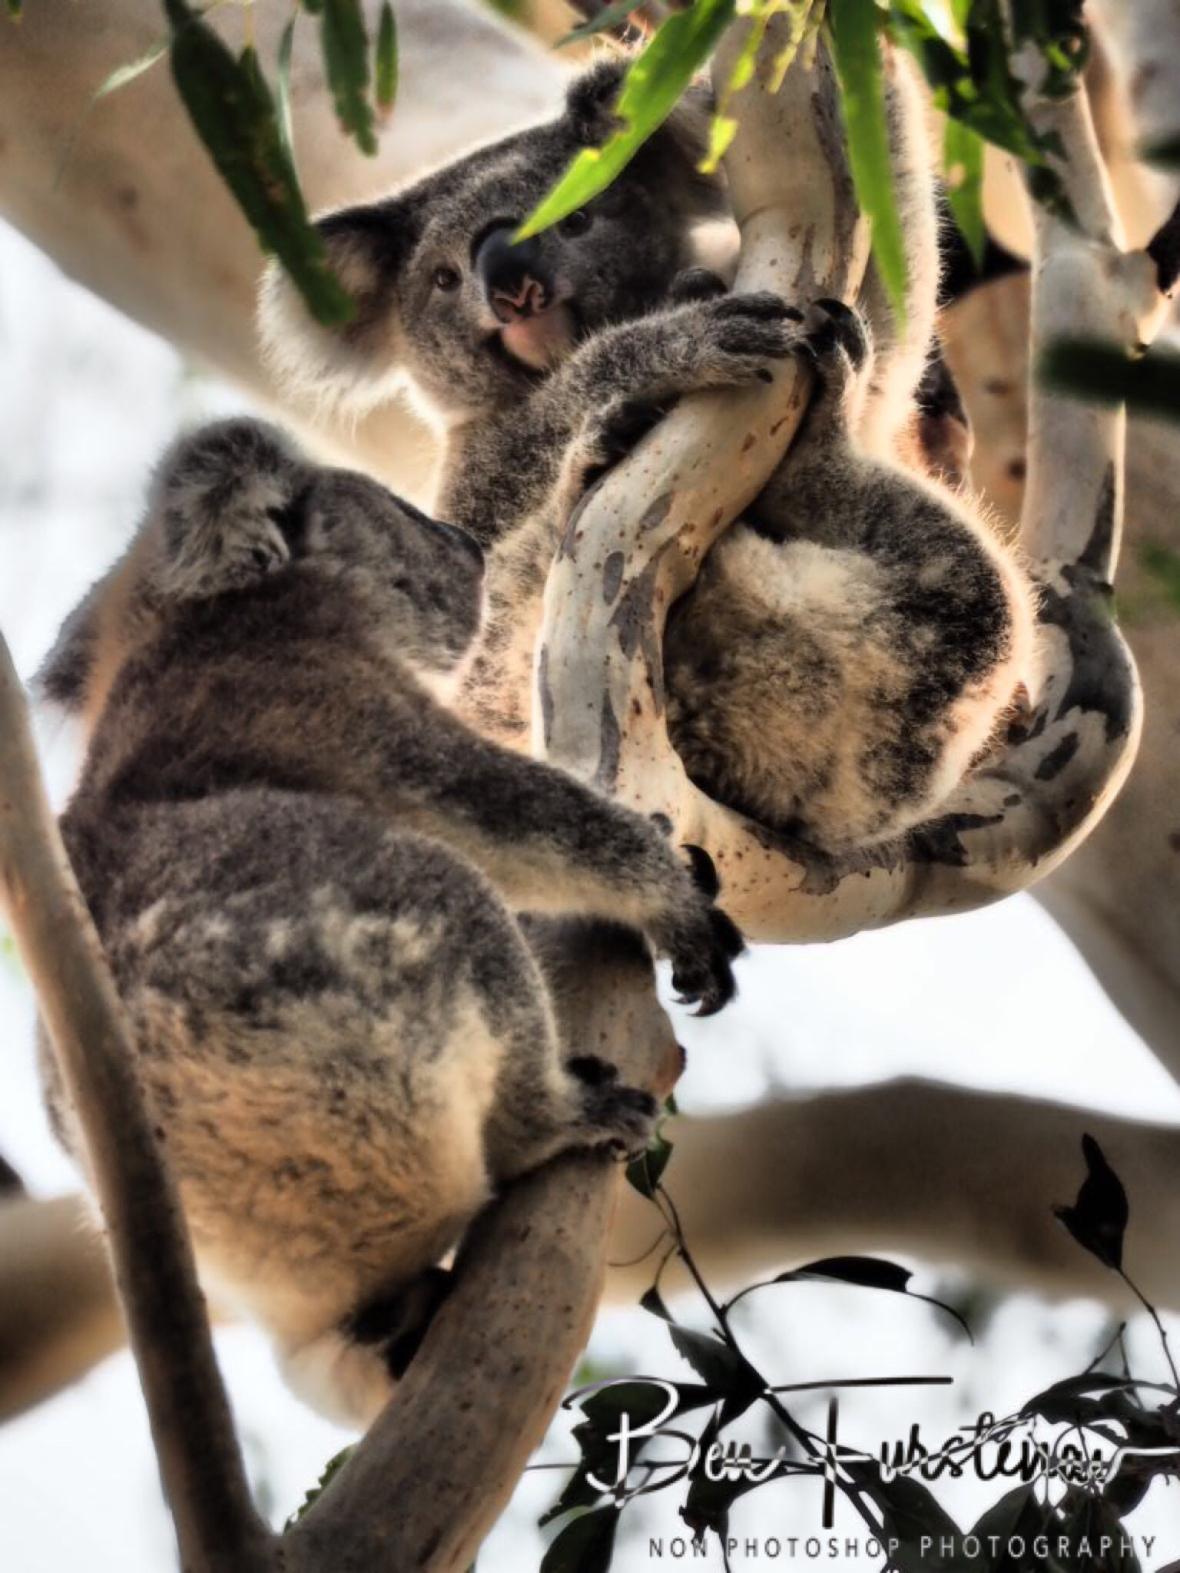 Happy reunion at Woodburn, Northern New South Wales, Australia